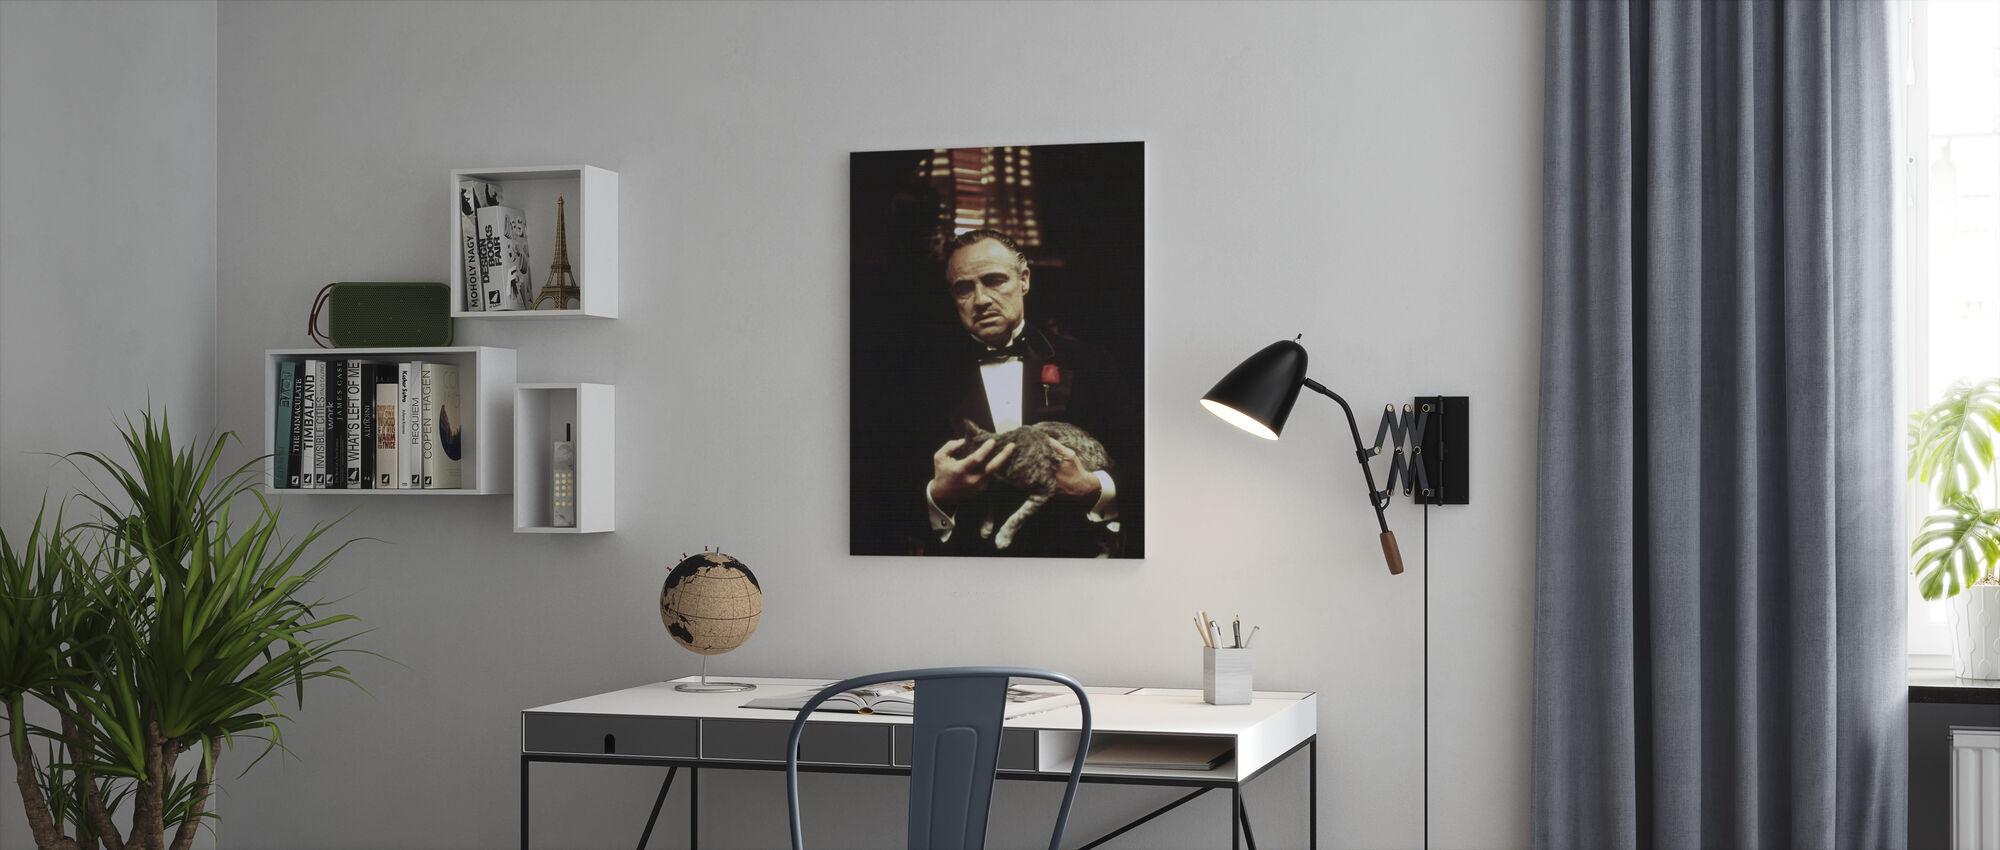 De peetvader Draagende Kat - Canvas print - Kantoor